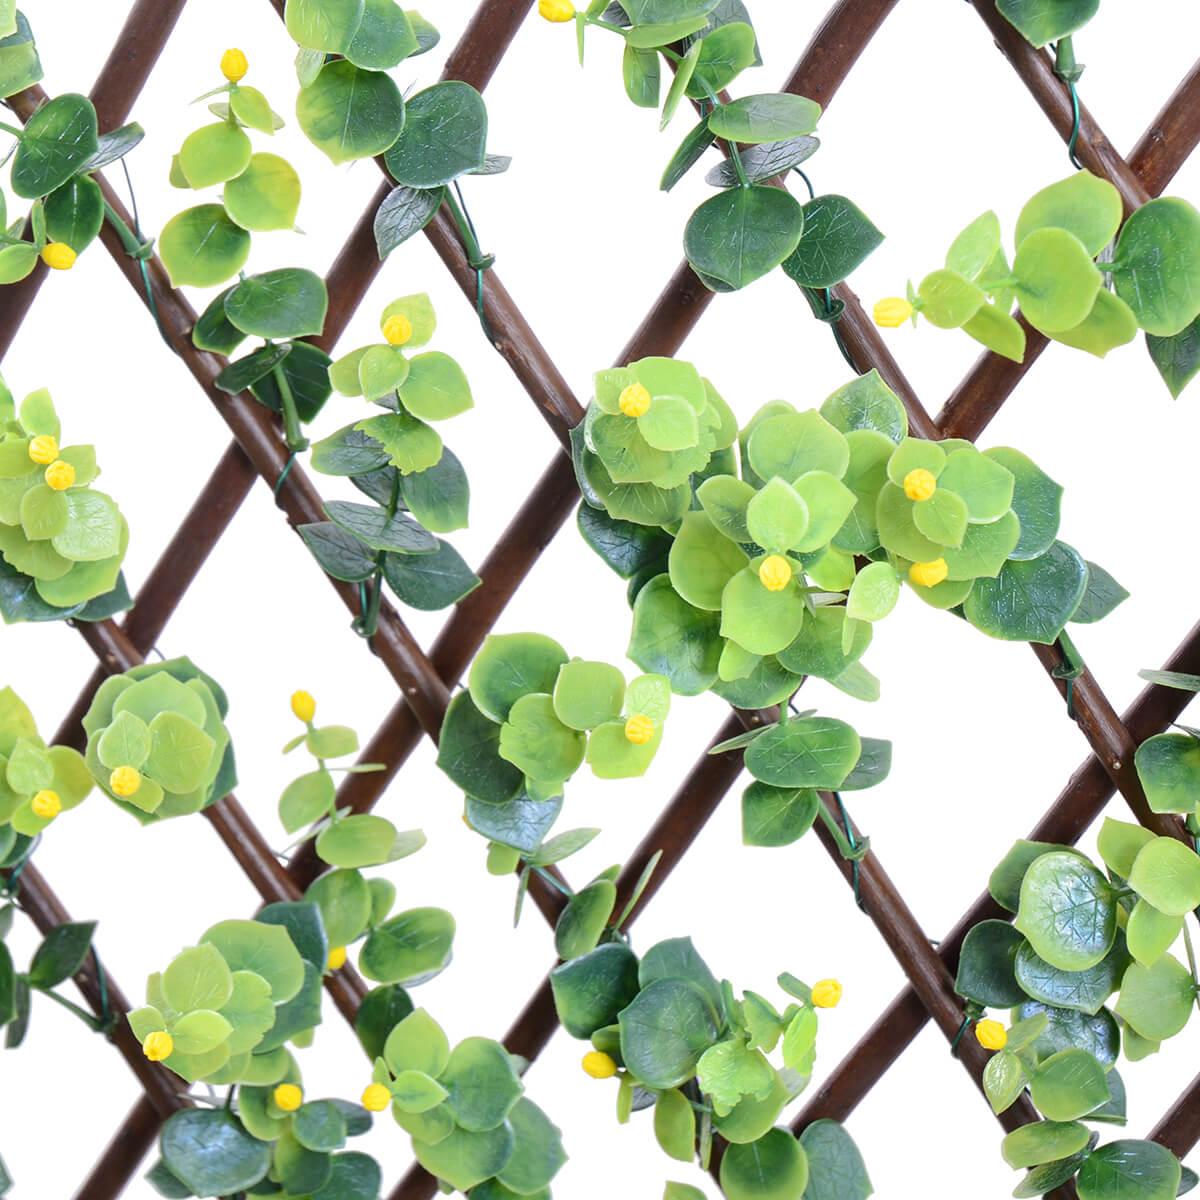 Berry Arbors: Expandable Trellis Ilex, Natural Willow & Yellow Berries